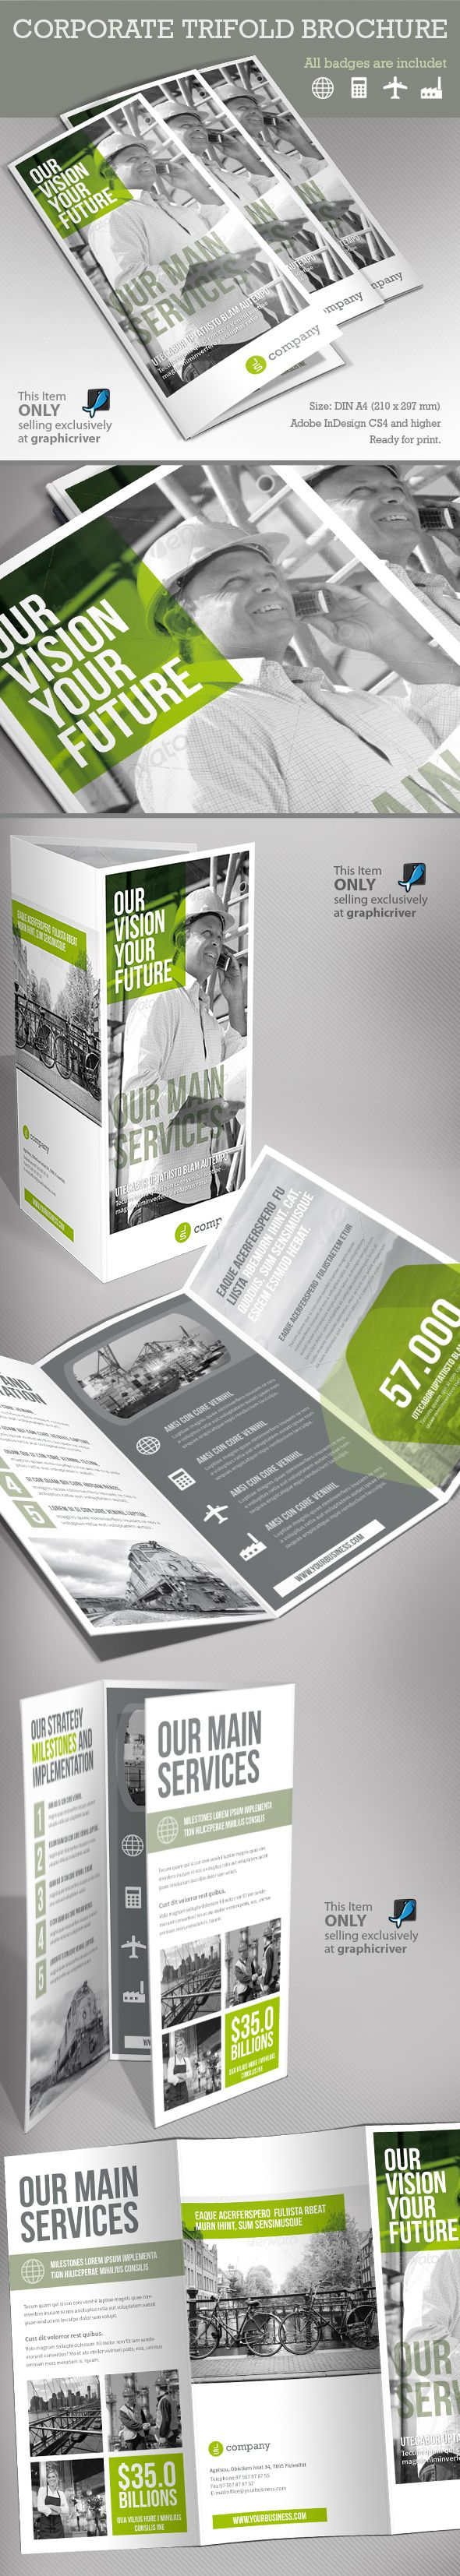 Corporate Tri-fold Brochure on Behance